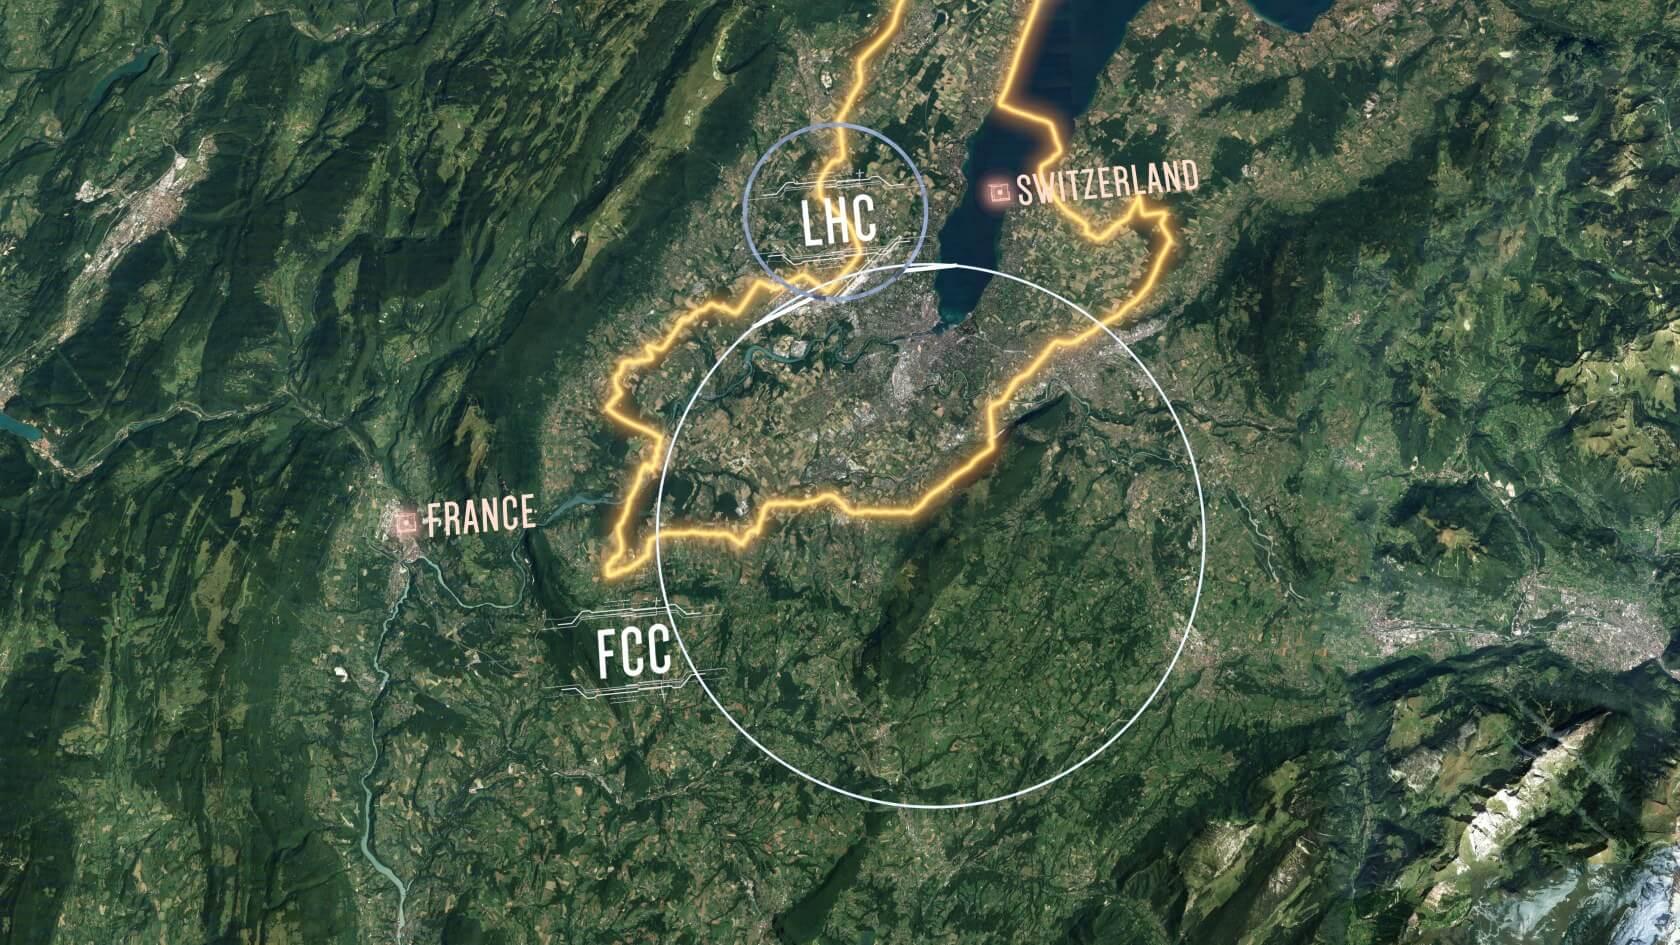 CERN宣布建造大型粒子加速器探索粒子物理领域